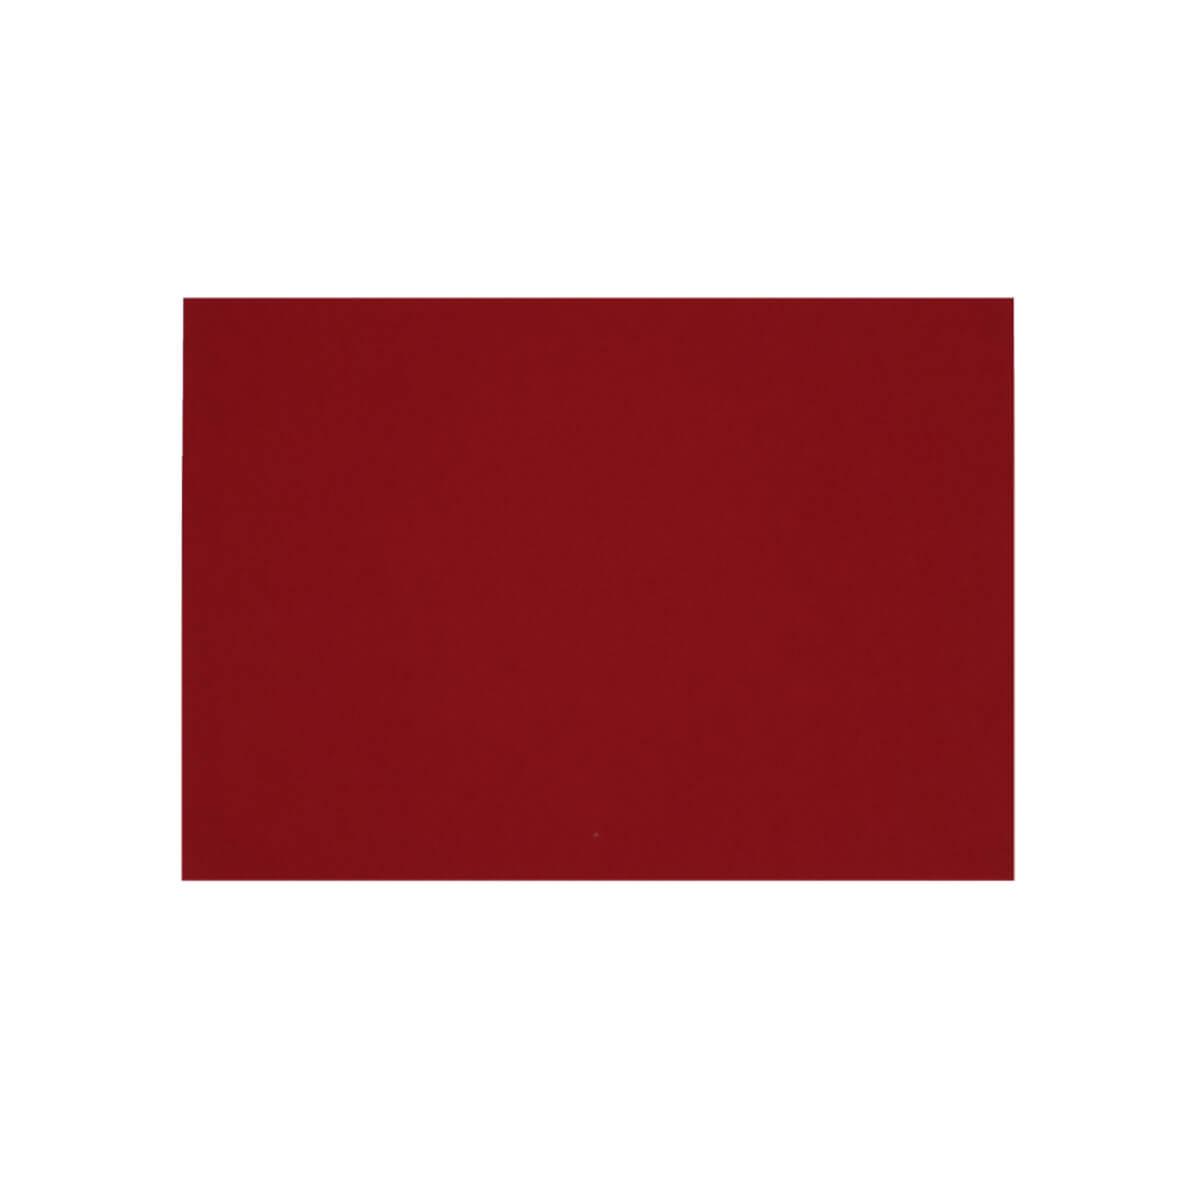 C5 DARK RED V-FLAP PEEL AND SEAL ENVELOPES